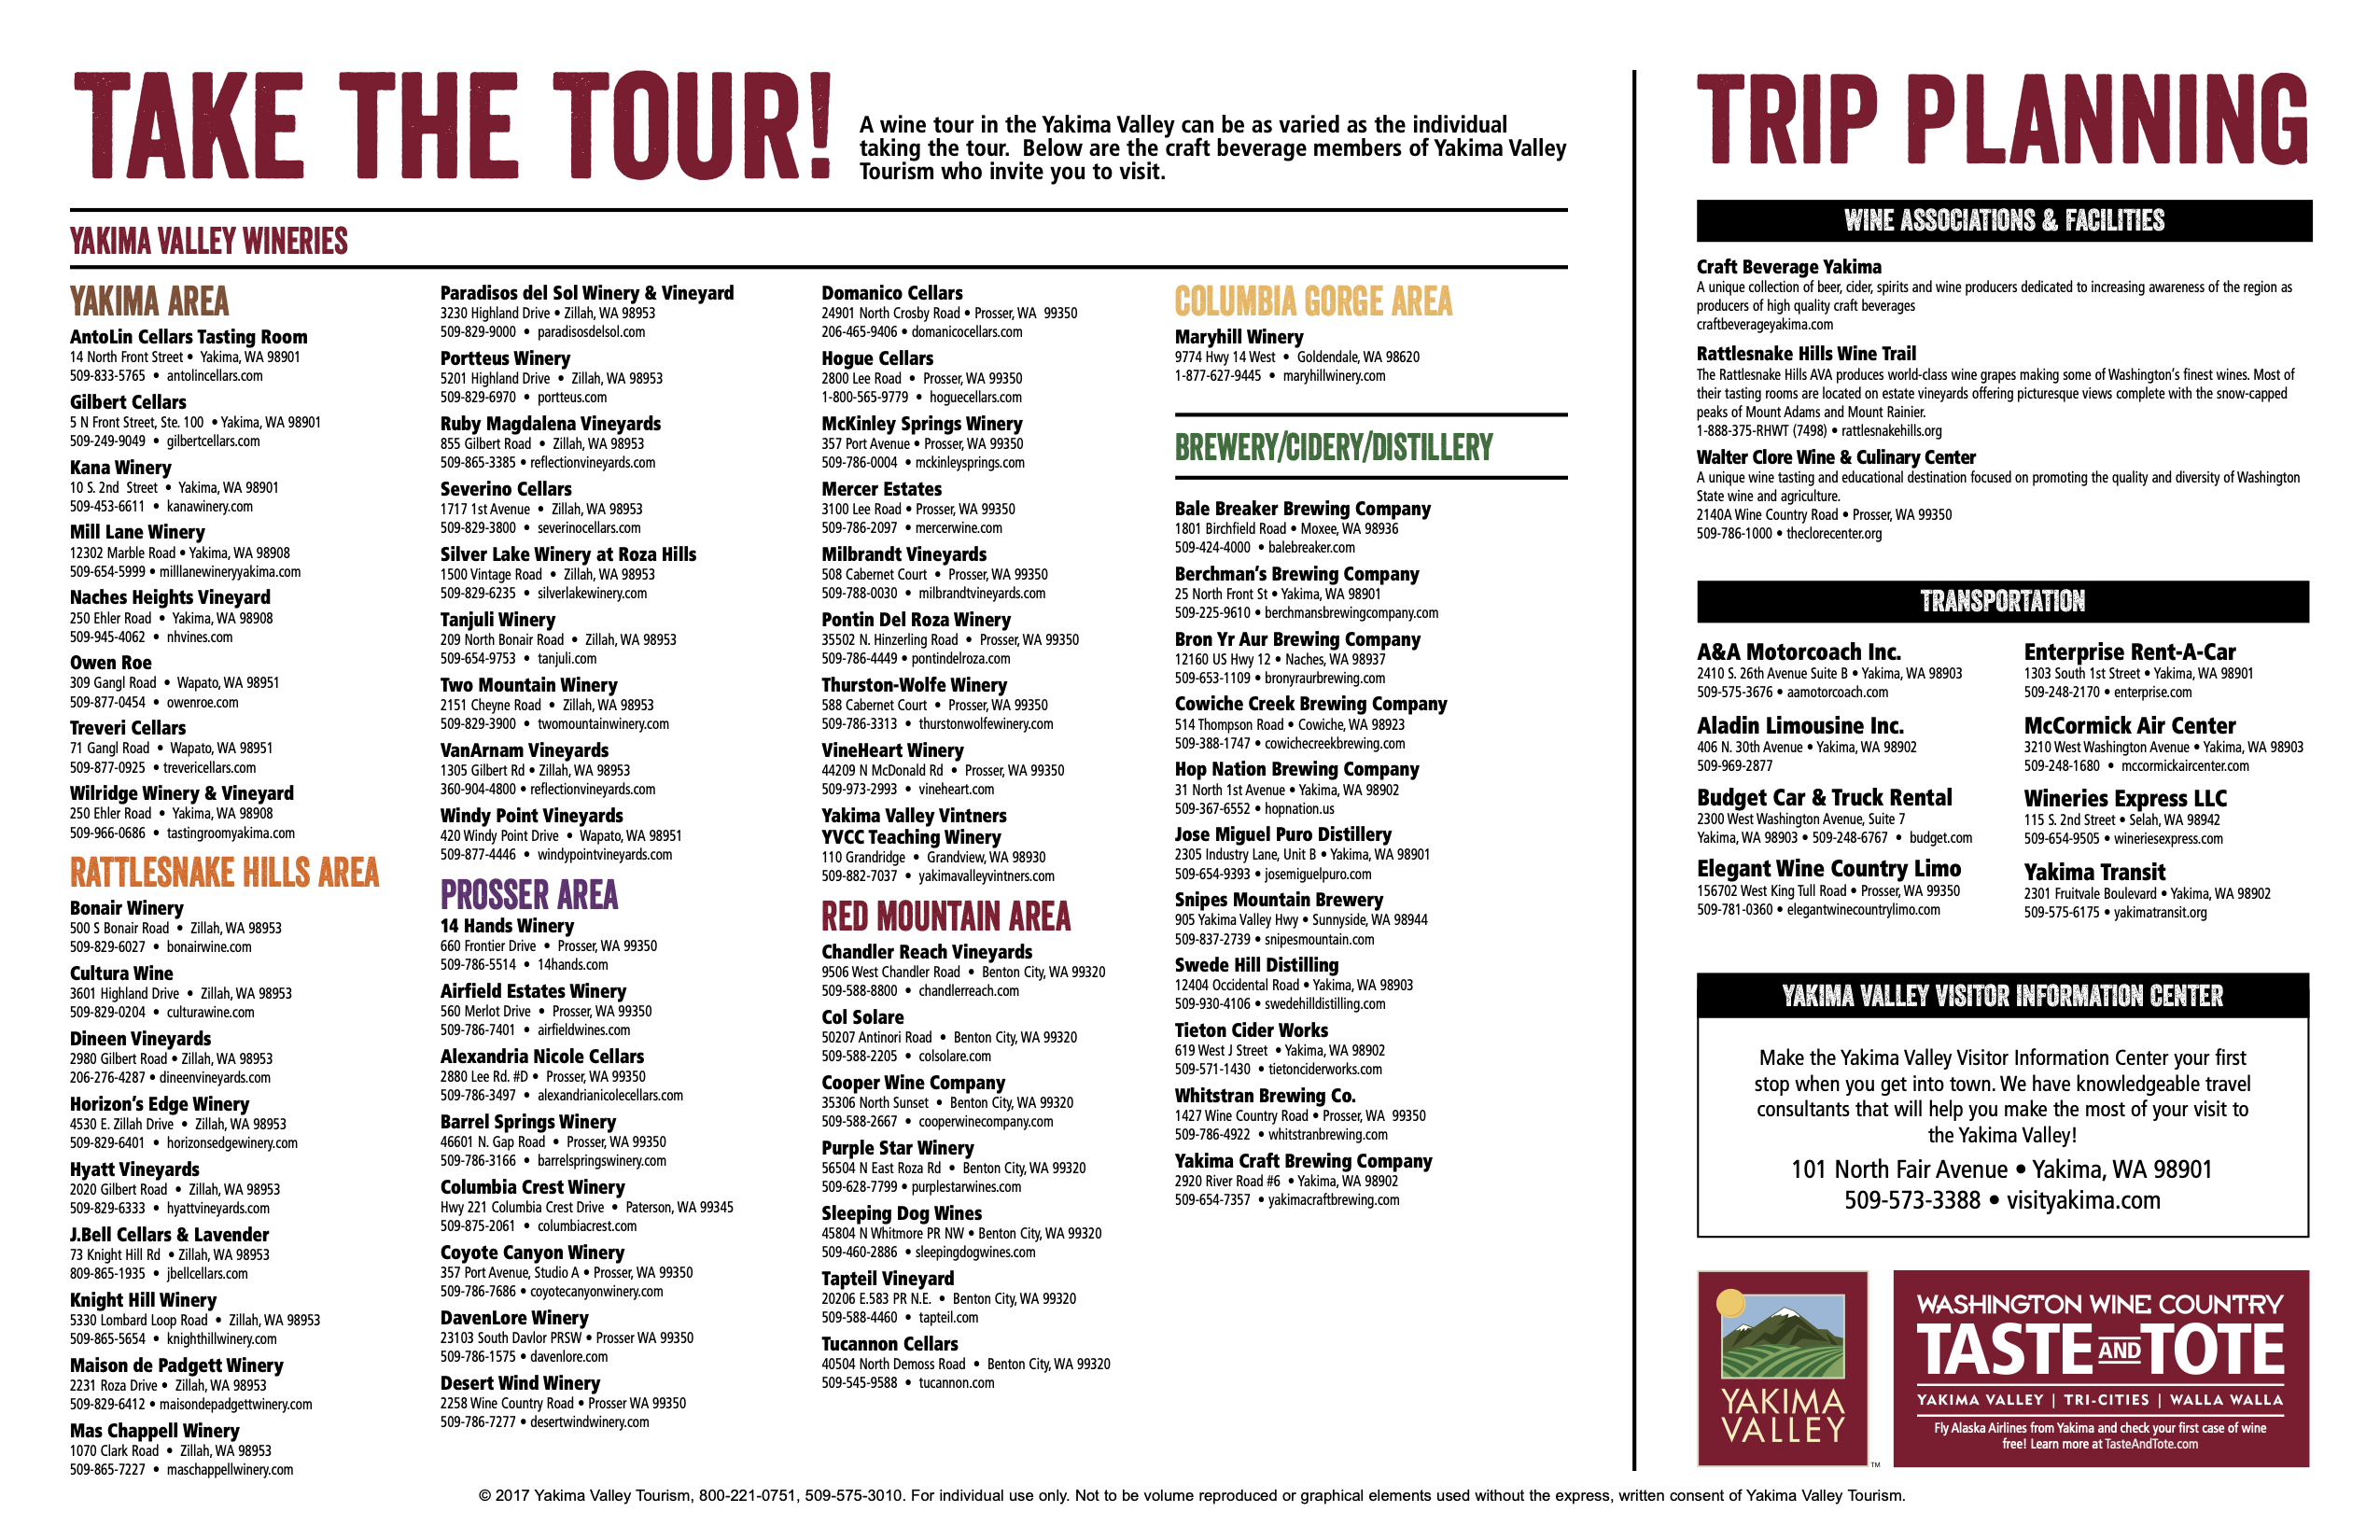 Yakima Craft Beverage Map Tour